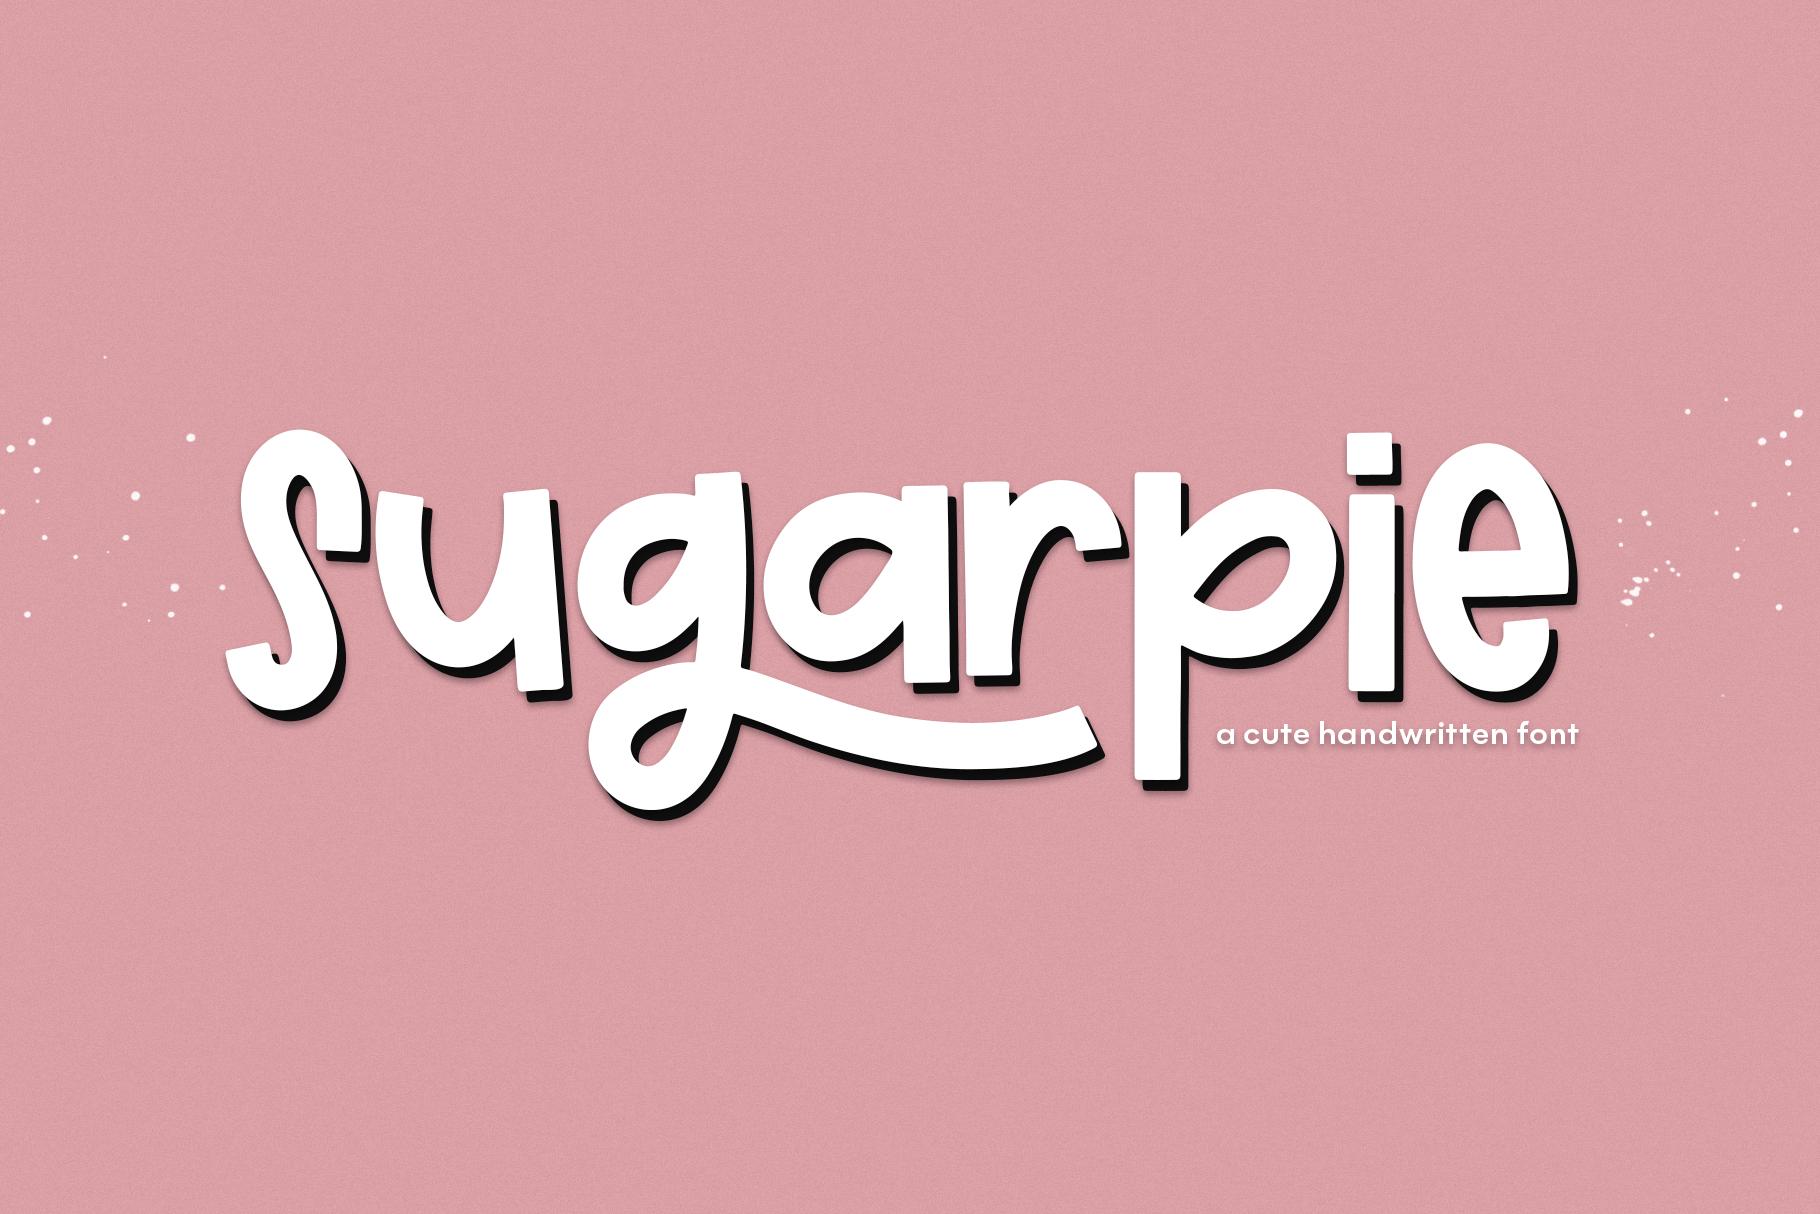 Sugarpie A Cute Quirky Handwritten Font By Ka Designs